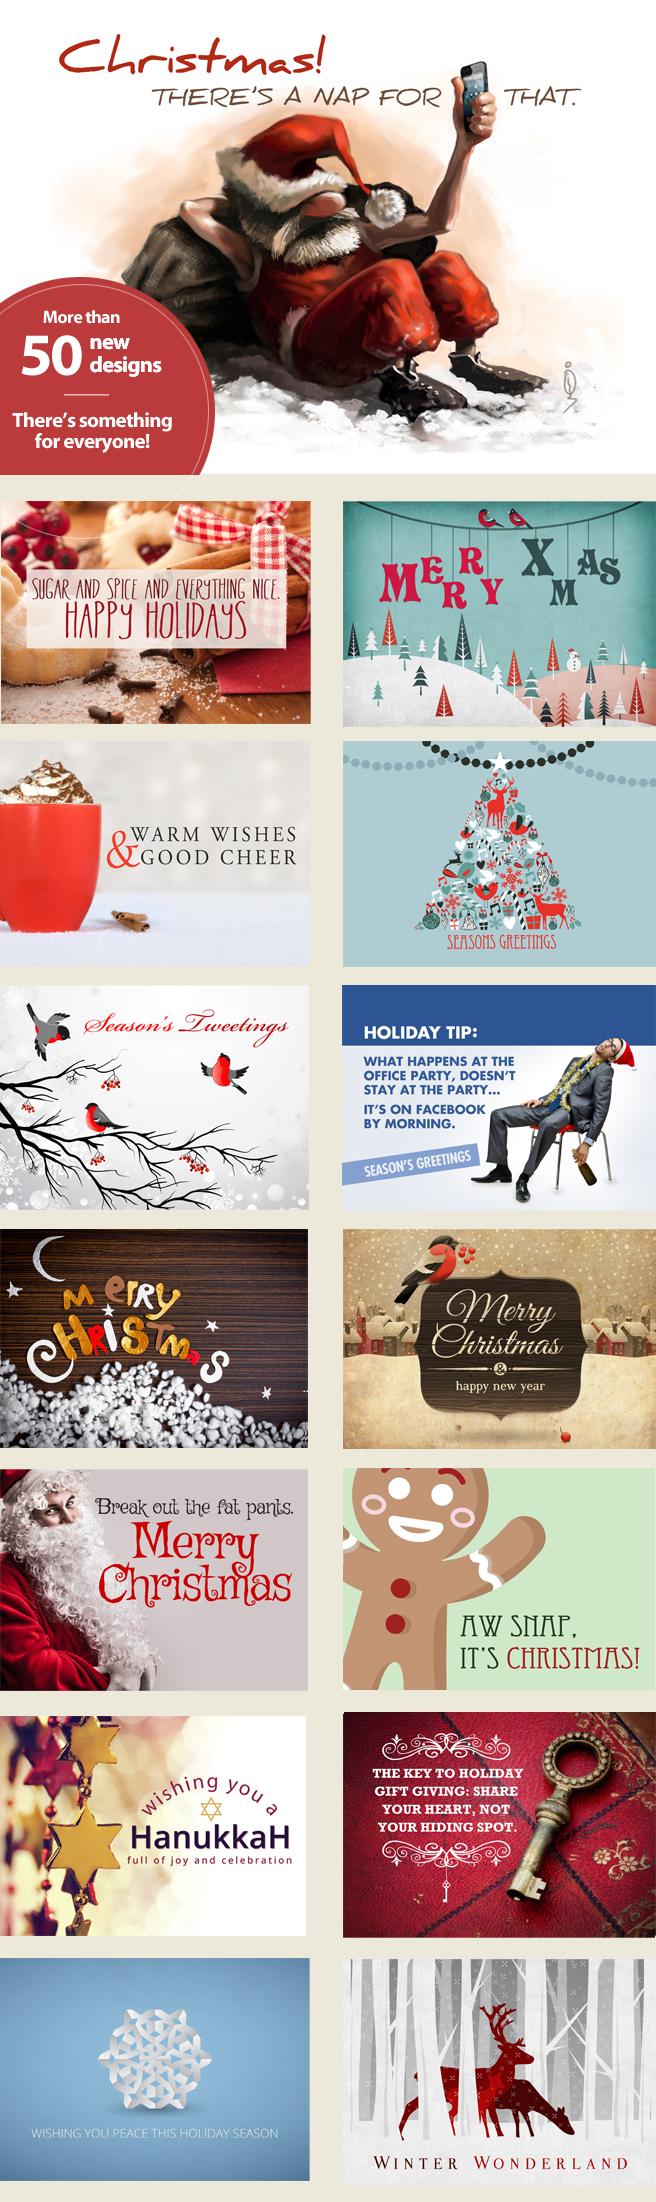 holiday designsblog